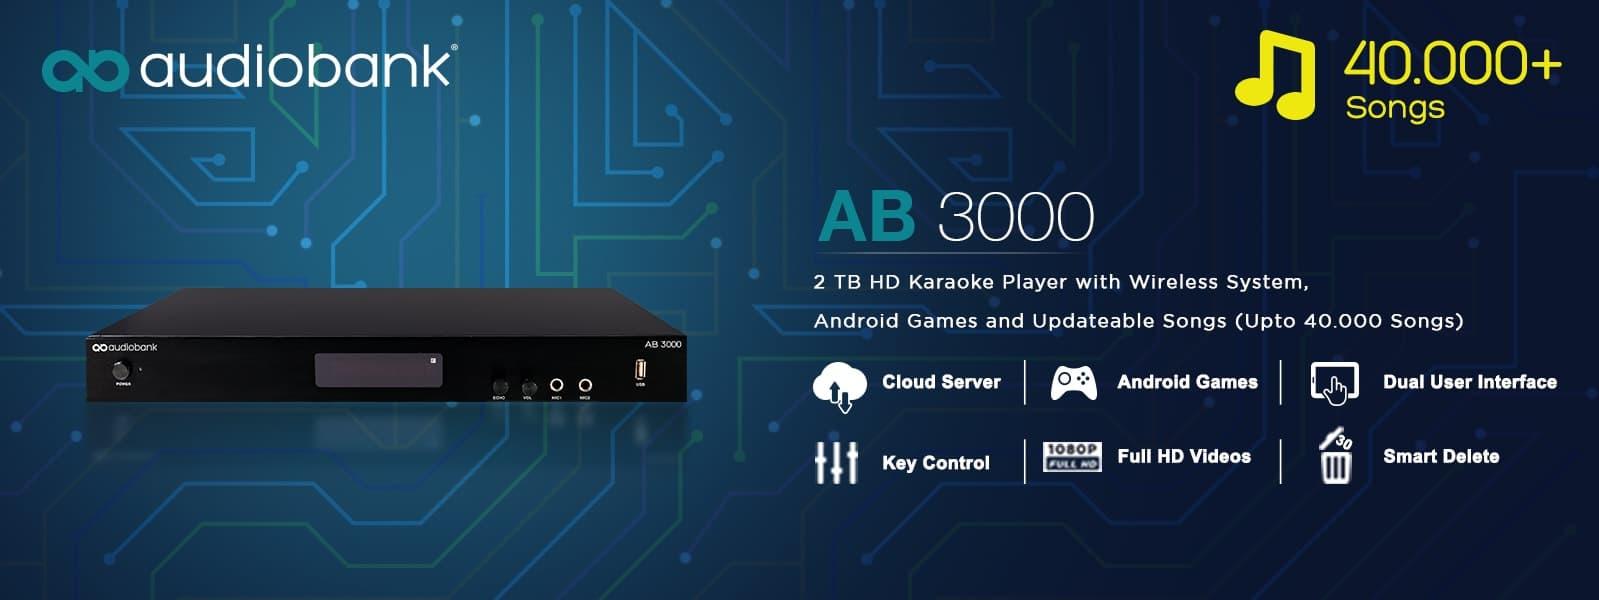 Bless Audio - Audiobank Ab 3000 + Hdd 2 Tb(39.000 Lagu) + LCD Monitor Screen Tc 100 - Blanja.com